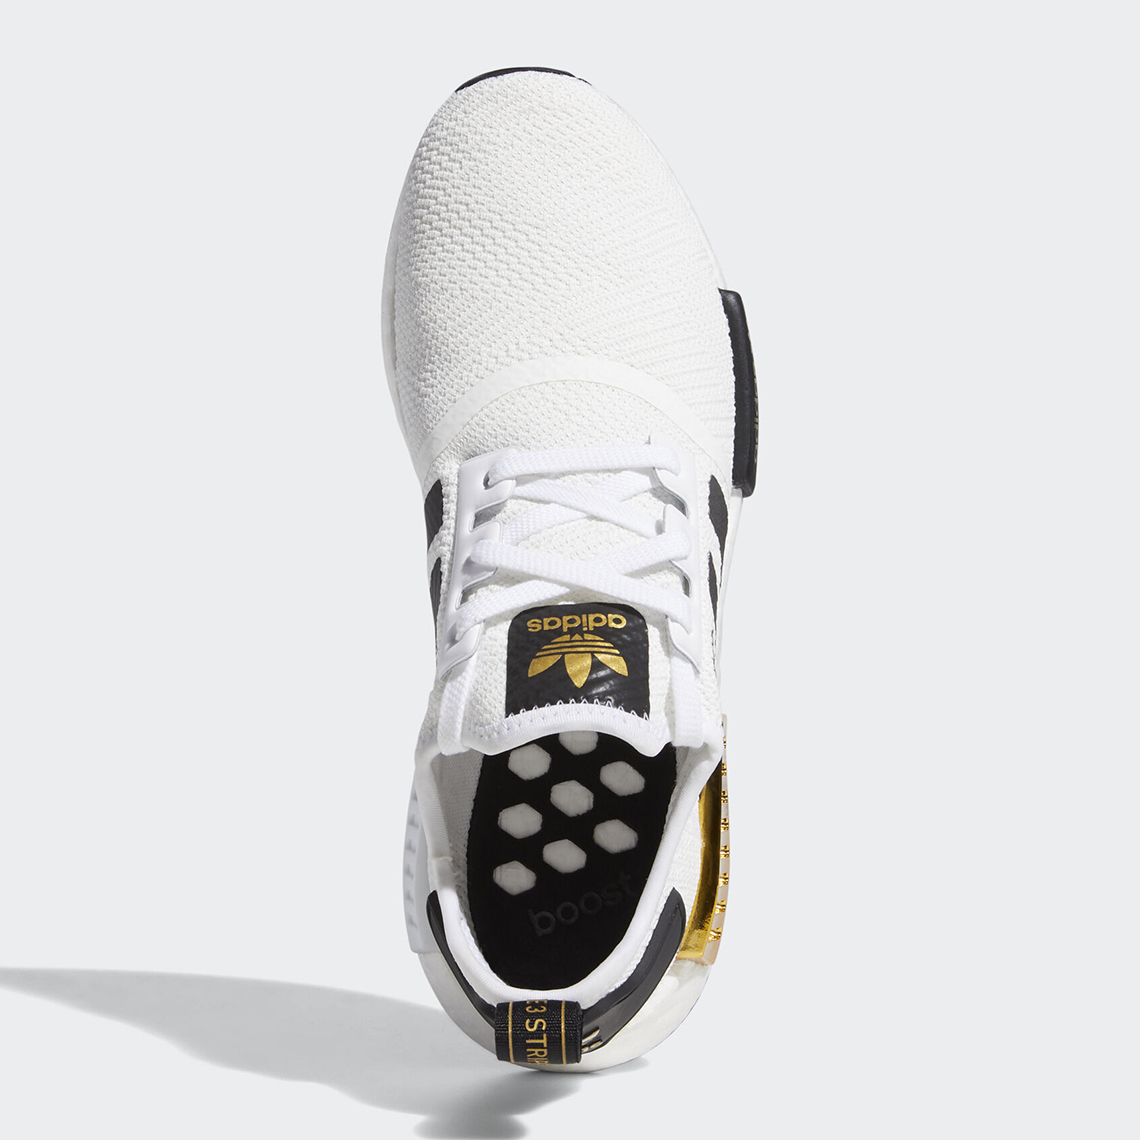 R1 Gold Eg5662 Store Adidas List White Black Nmd 7vgyYbf6